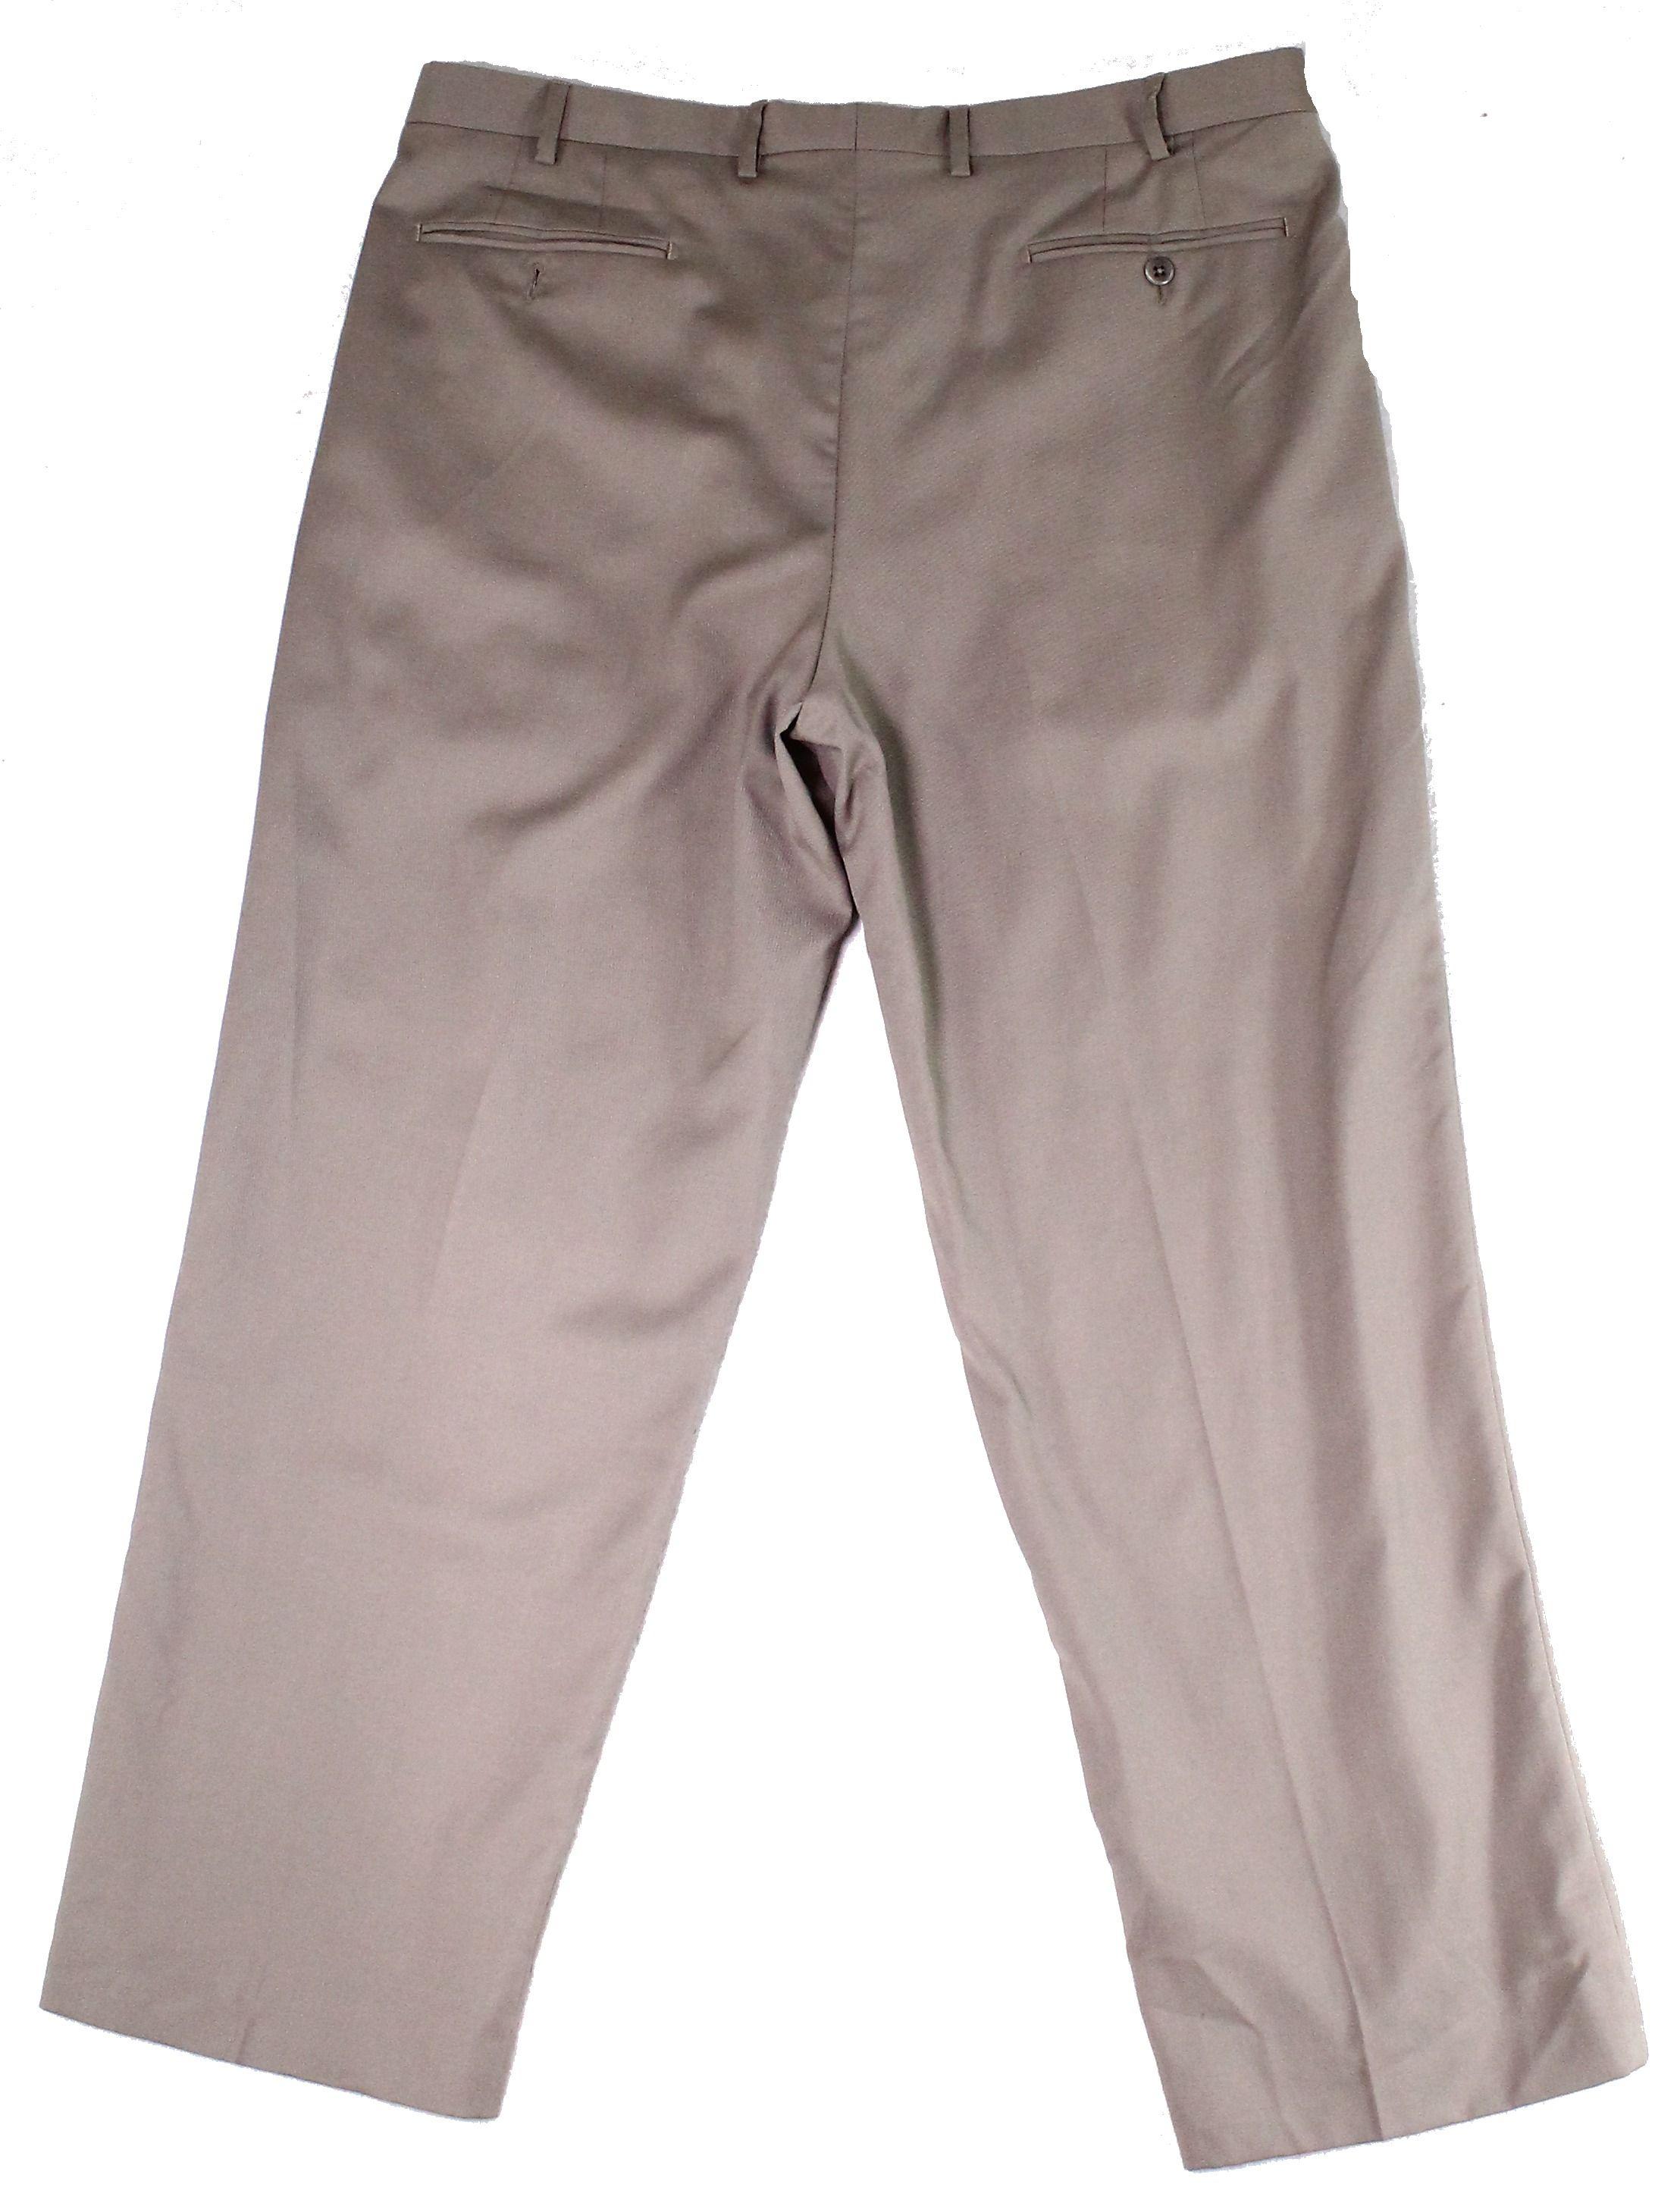 Zanella Mens Dress Pants Brown Size 38 Wool Stretch Waistband Solid